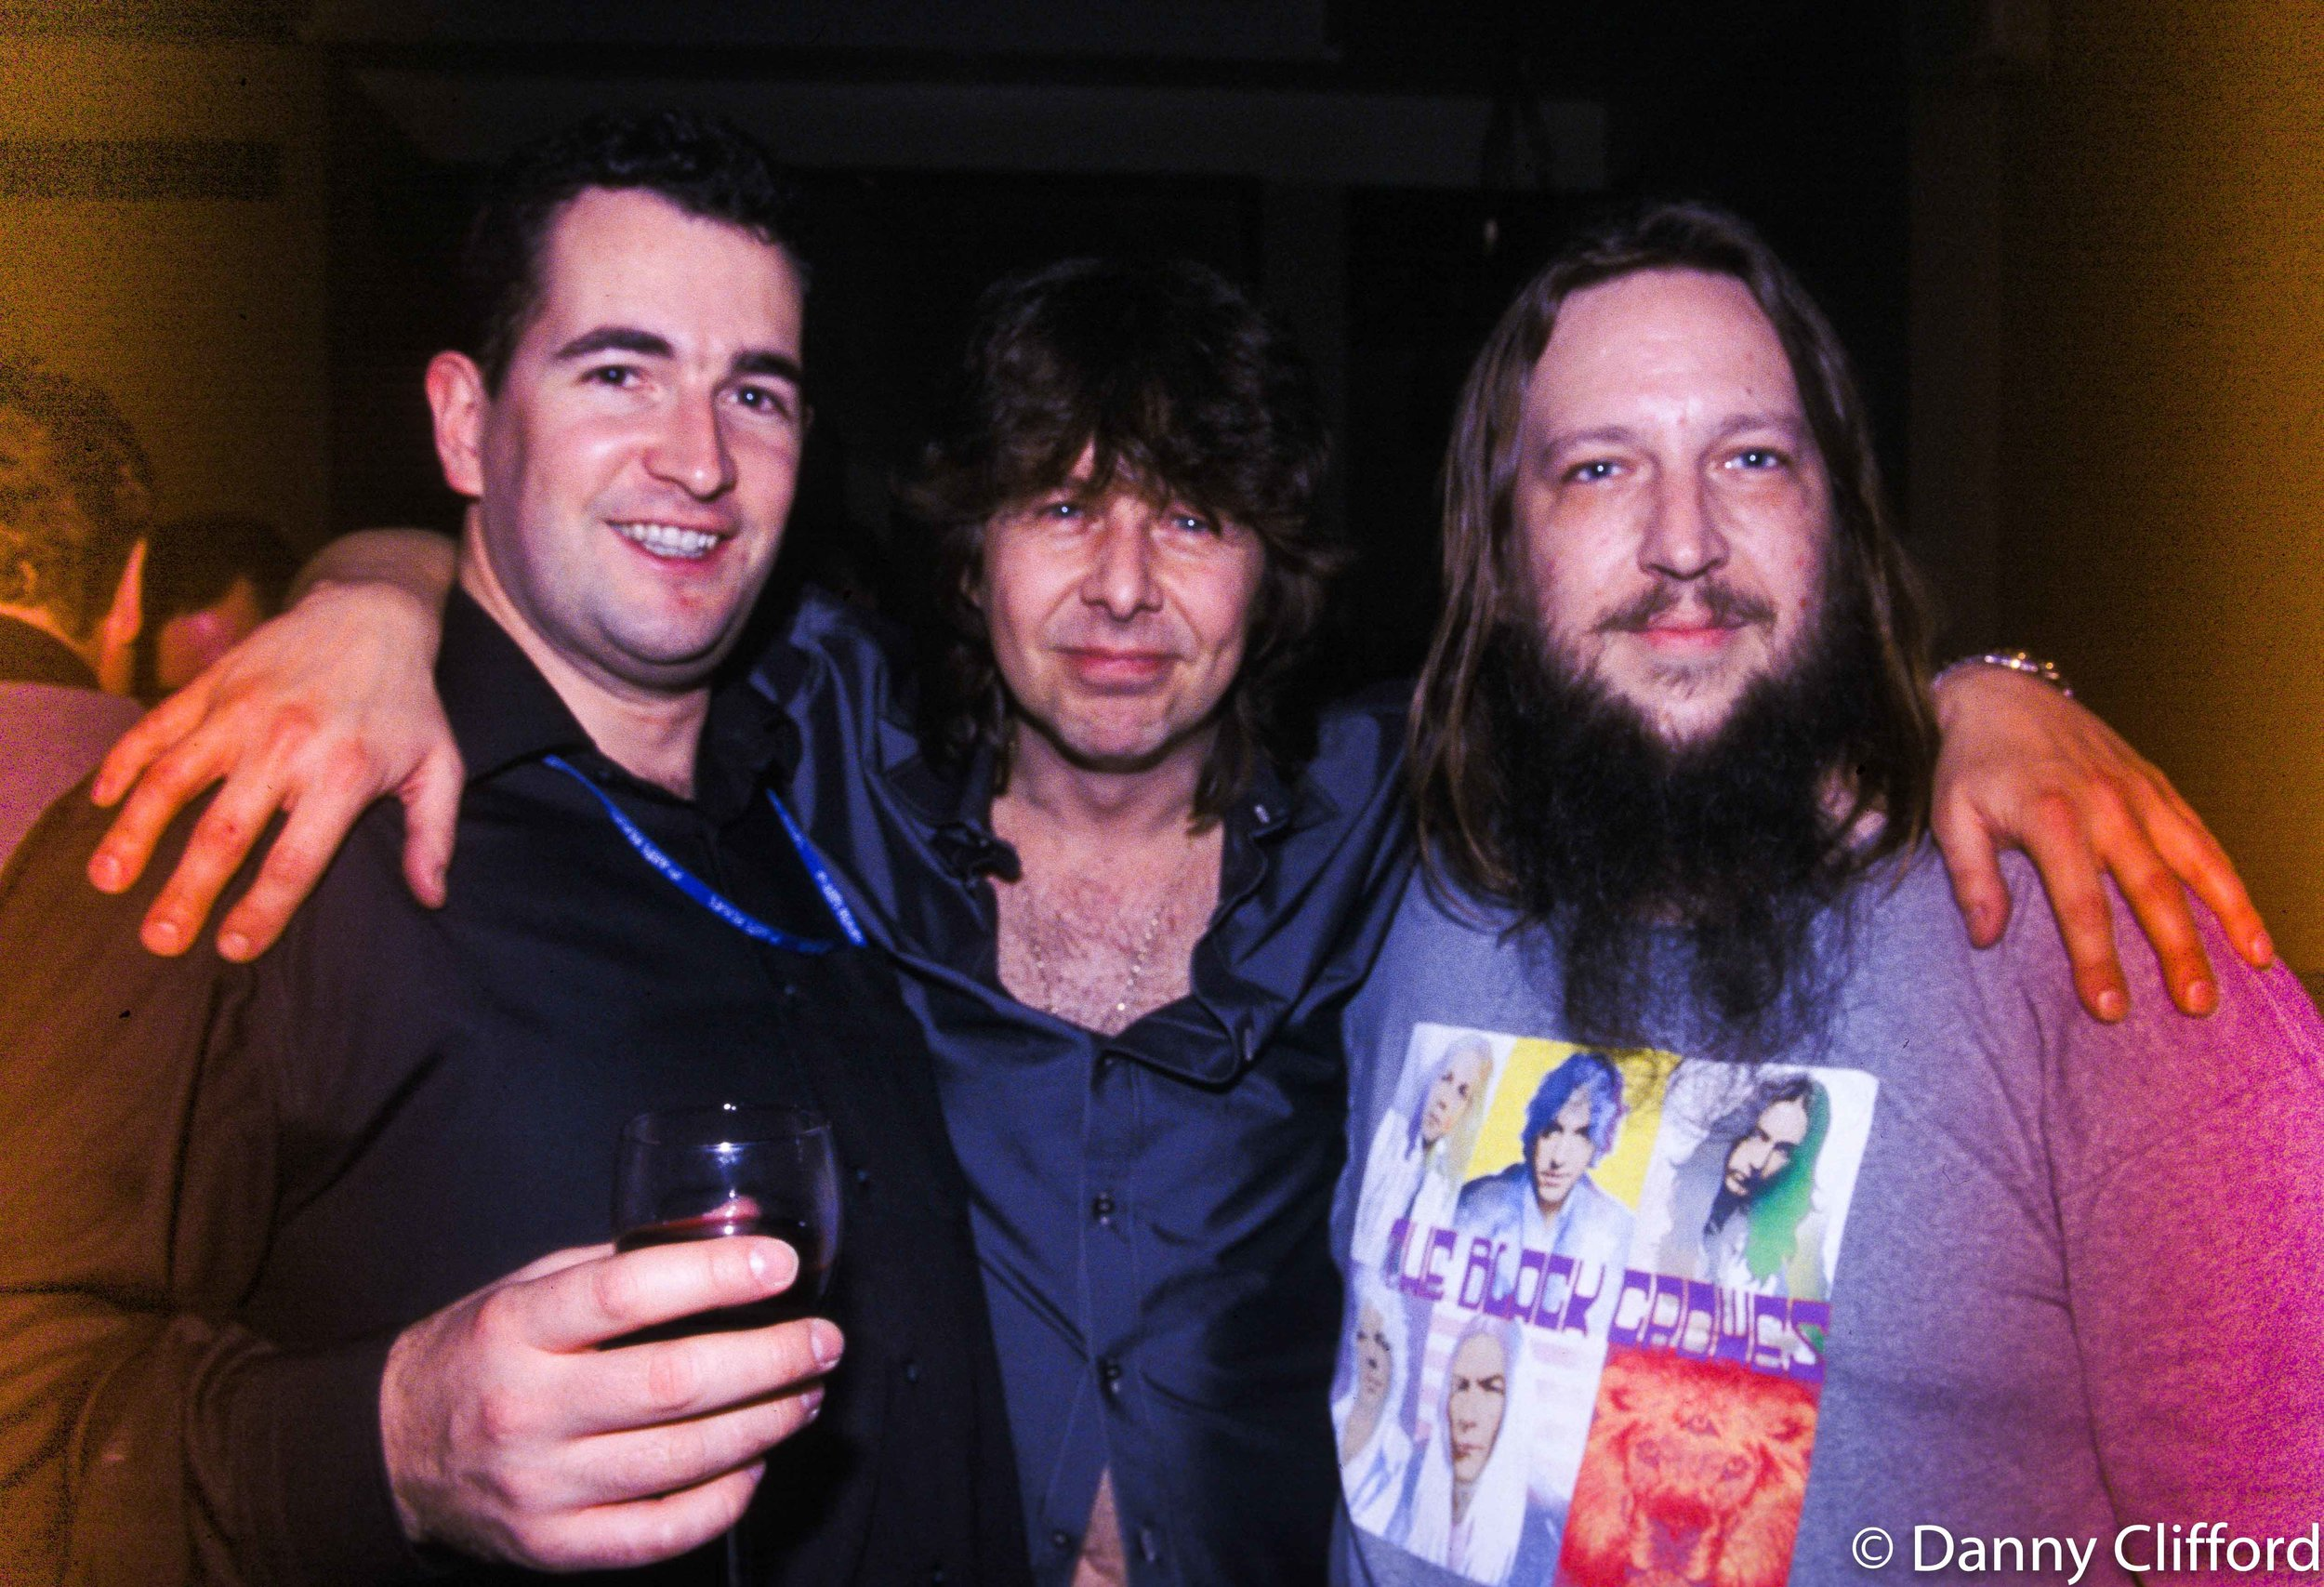 Paddy Hegan, Clive Burr & Robert (California) Roberts